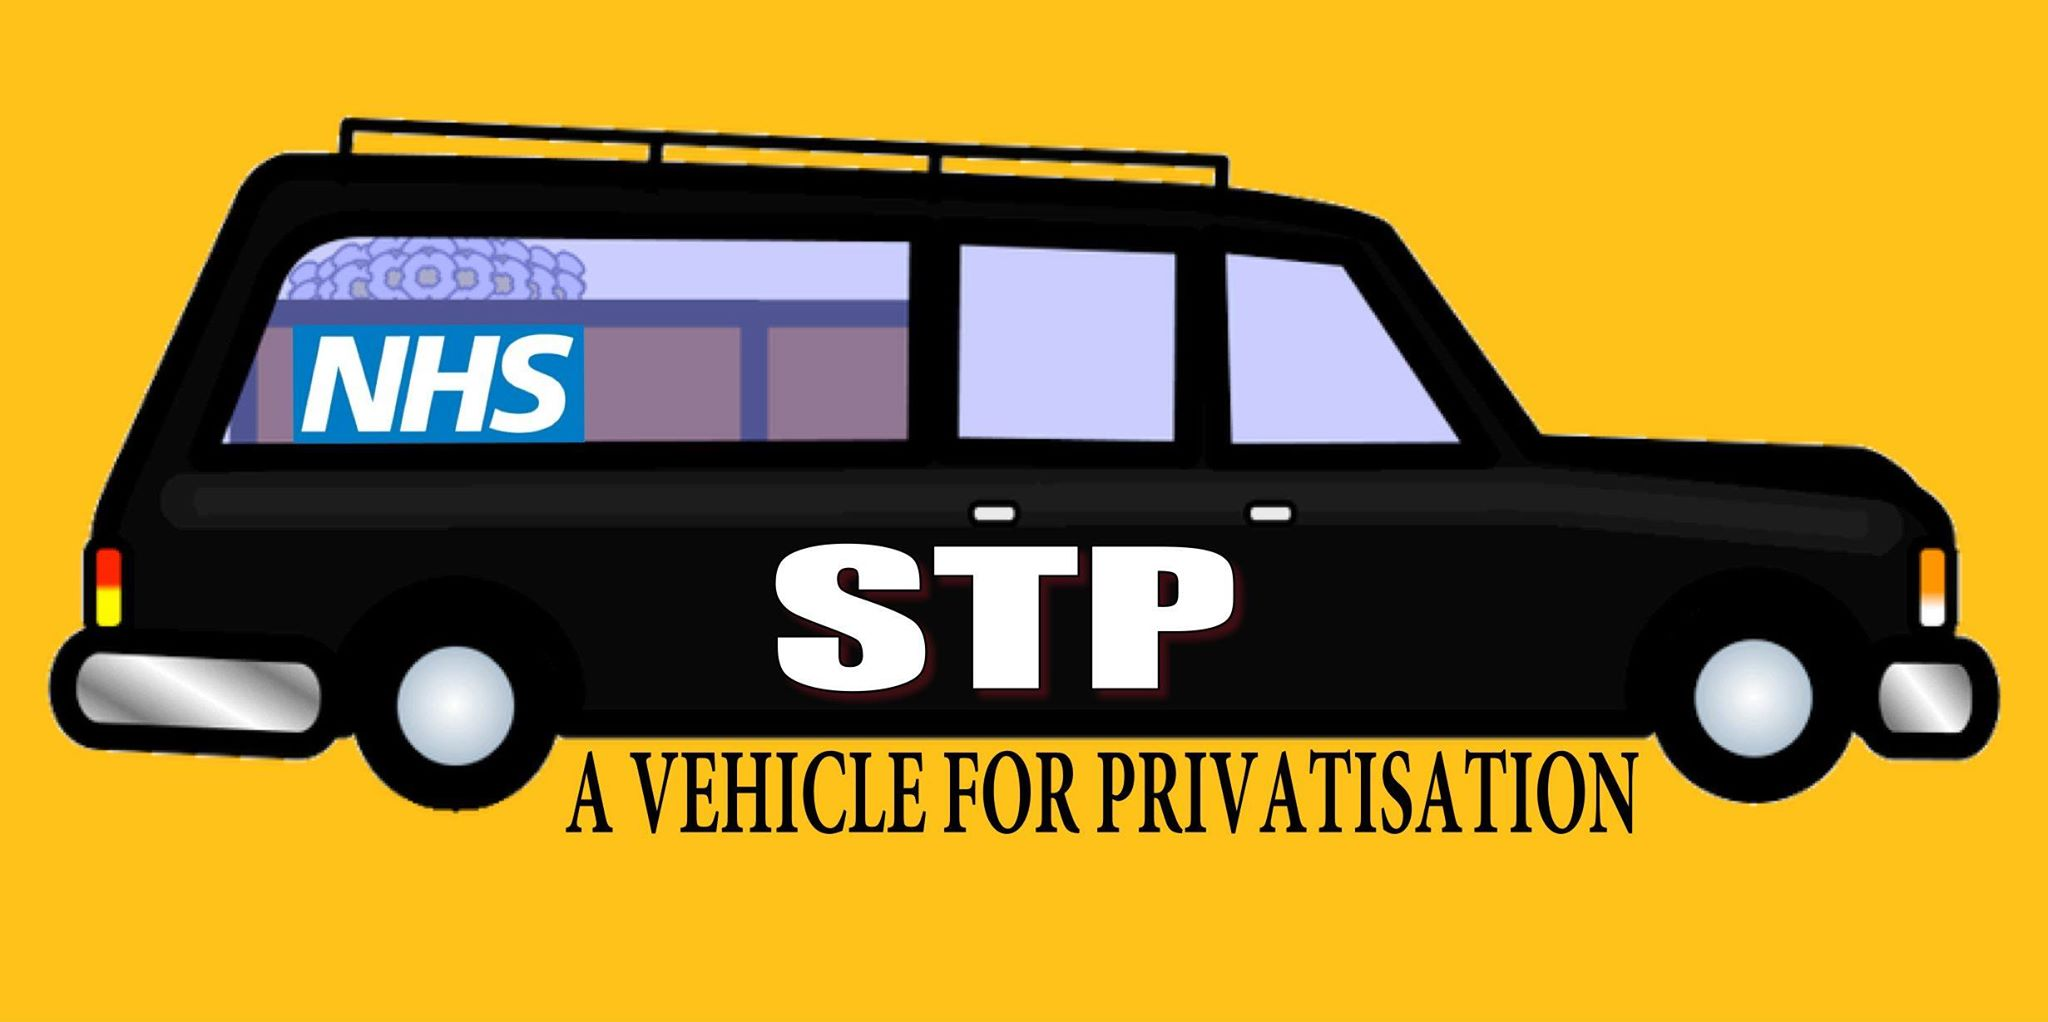 stp-vehicle-privatisation_o